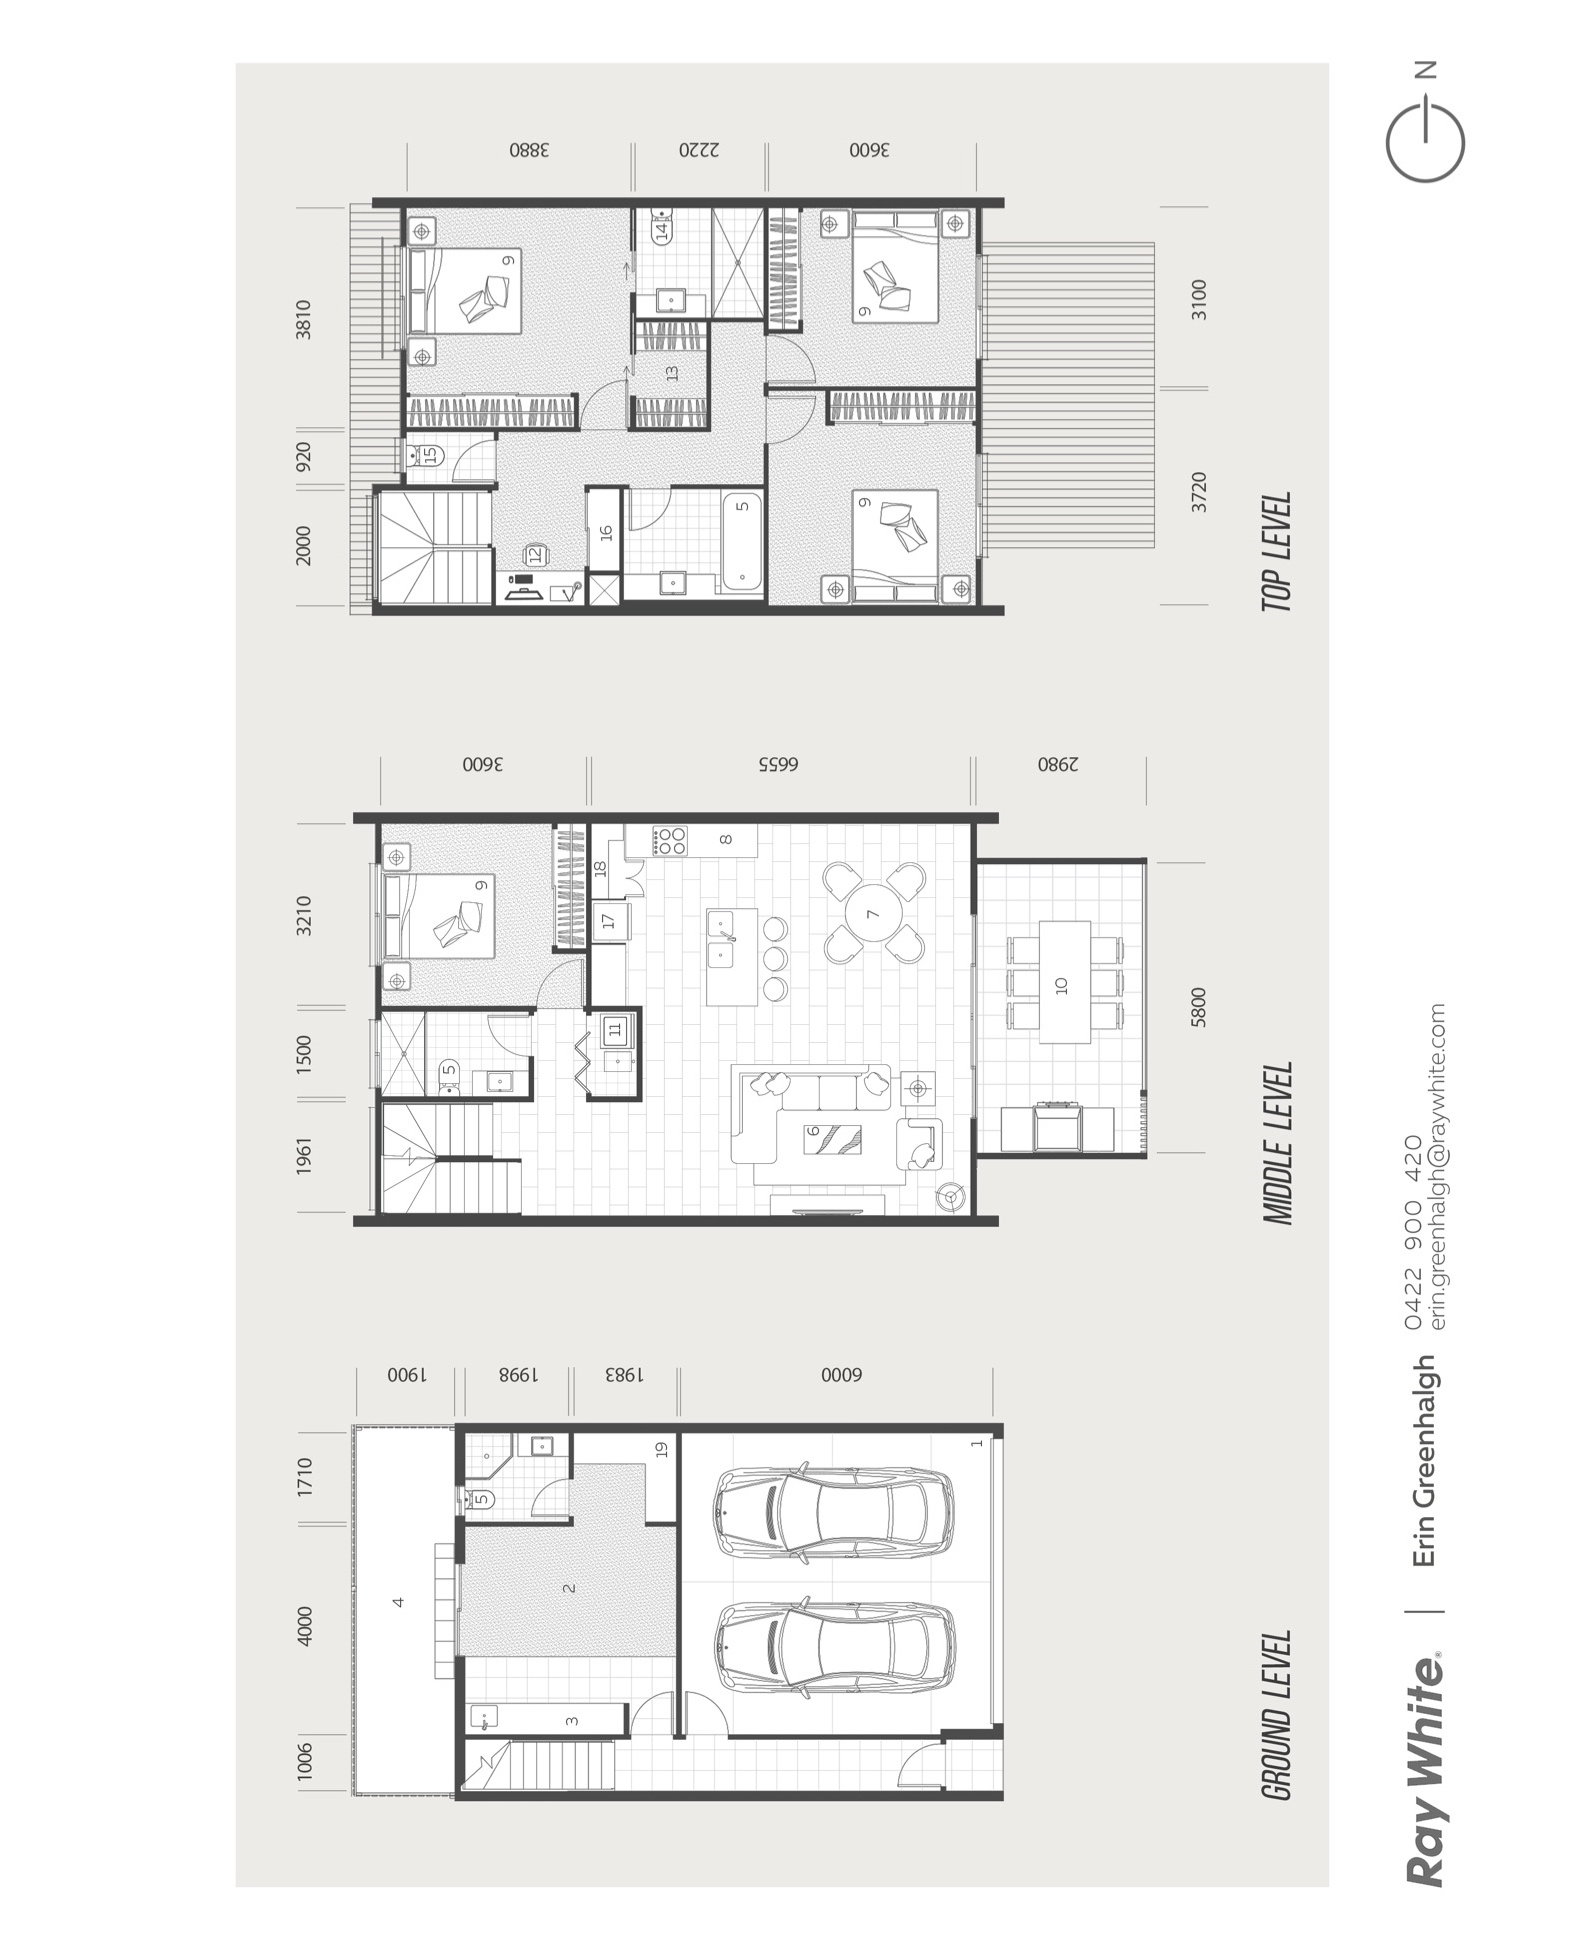 FLOOR_PLANS_TOWNHOUSE 2.jpg